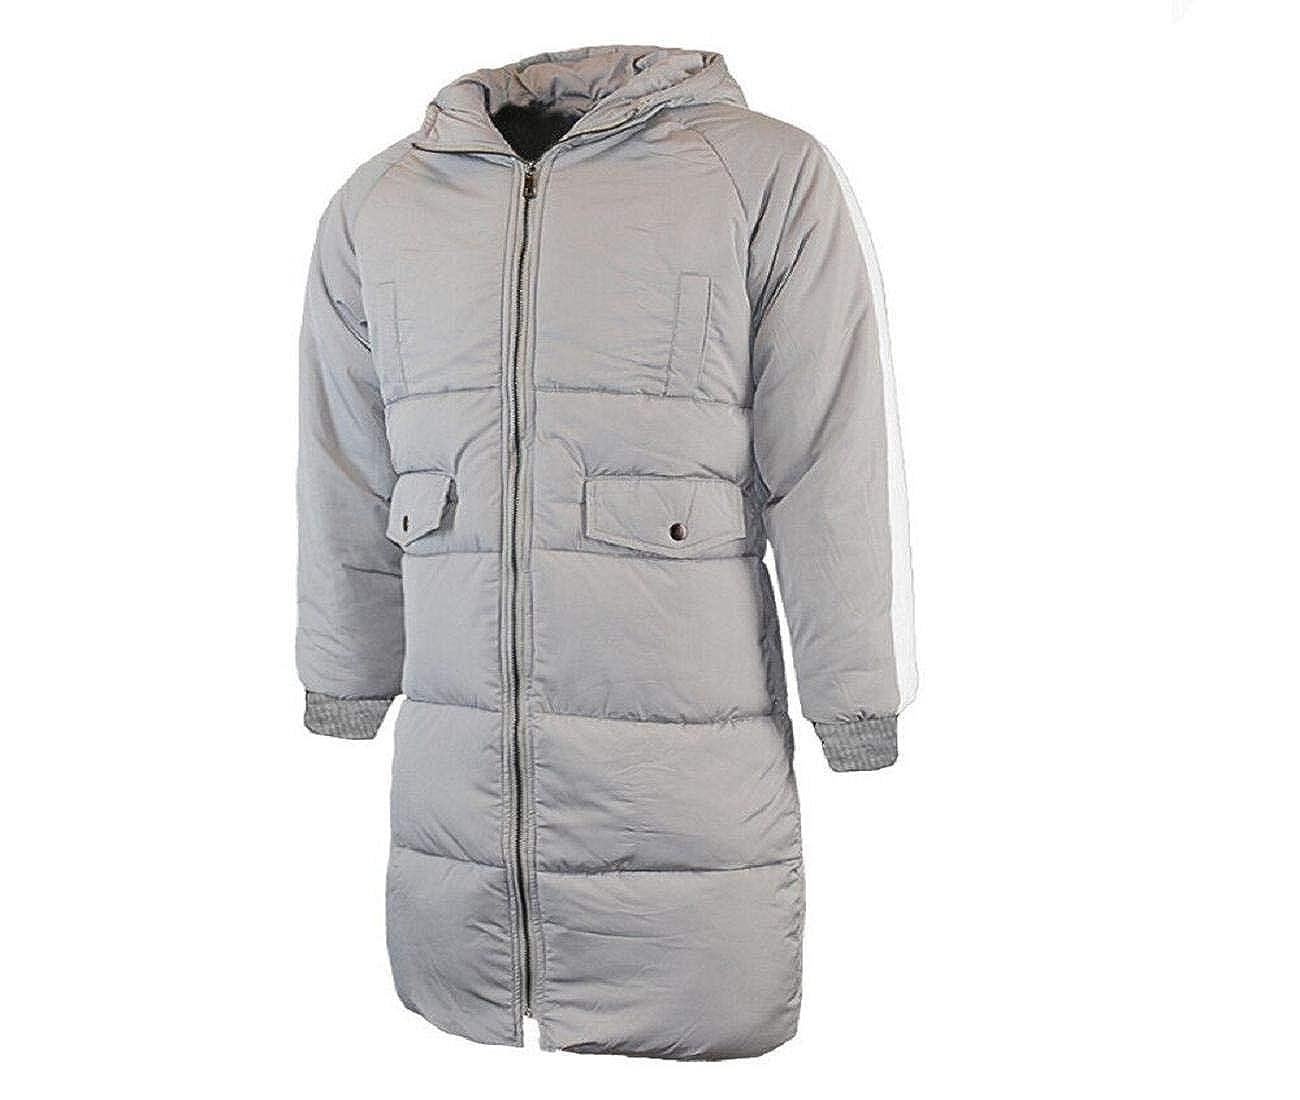 Manadlian Herren Winter Reißverschluss Kapuzenpullover Baumwolle Gepolstert Mantel Große Größe Baumwolle Outwear